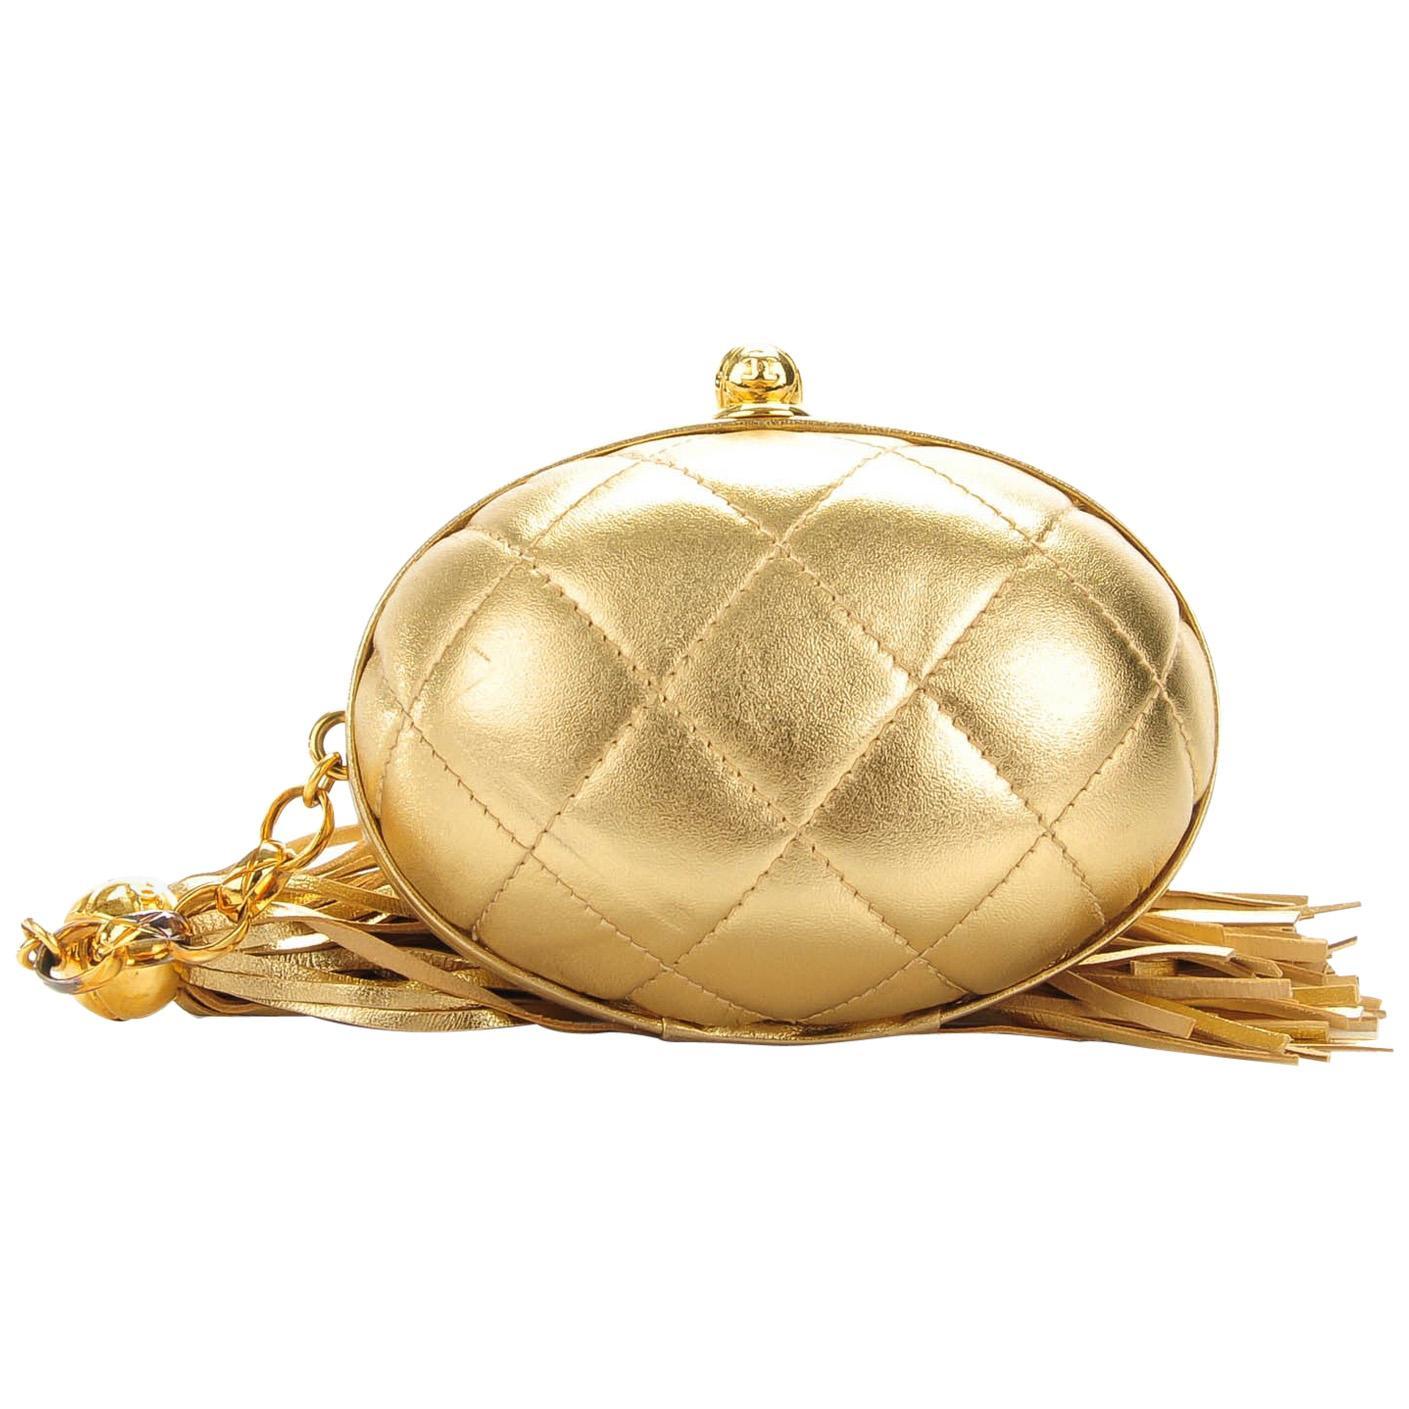 Chanel Vintage Metallic Gold Egg Minauderè Diamond Quilted Red Carpet Clutch